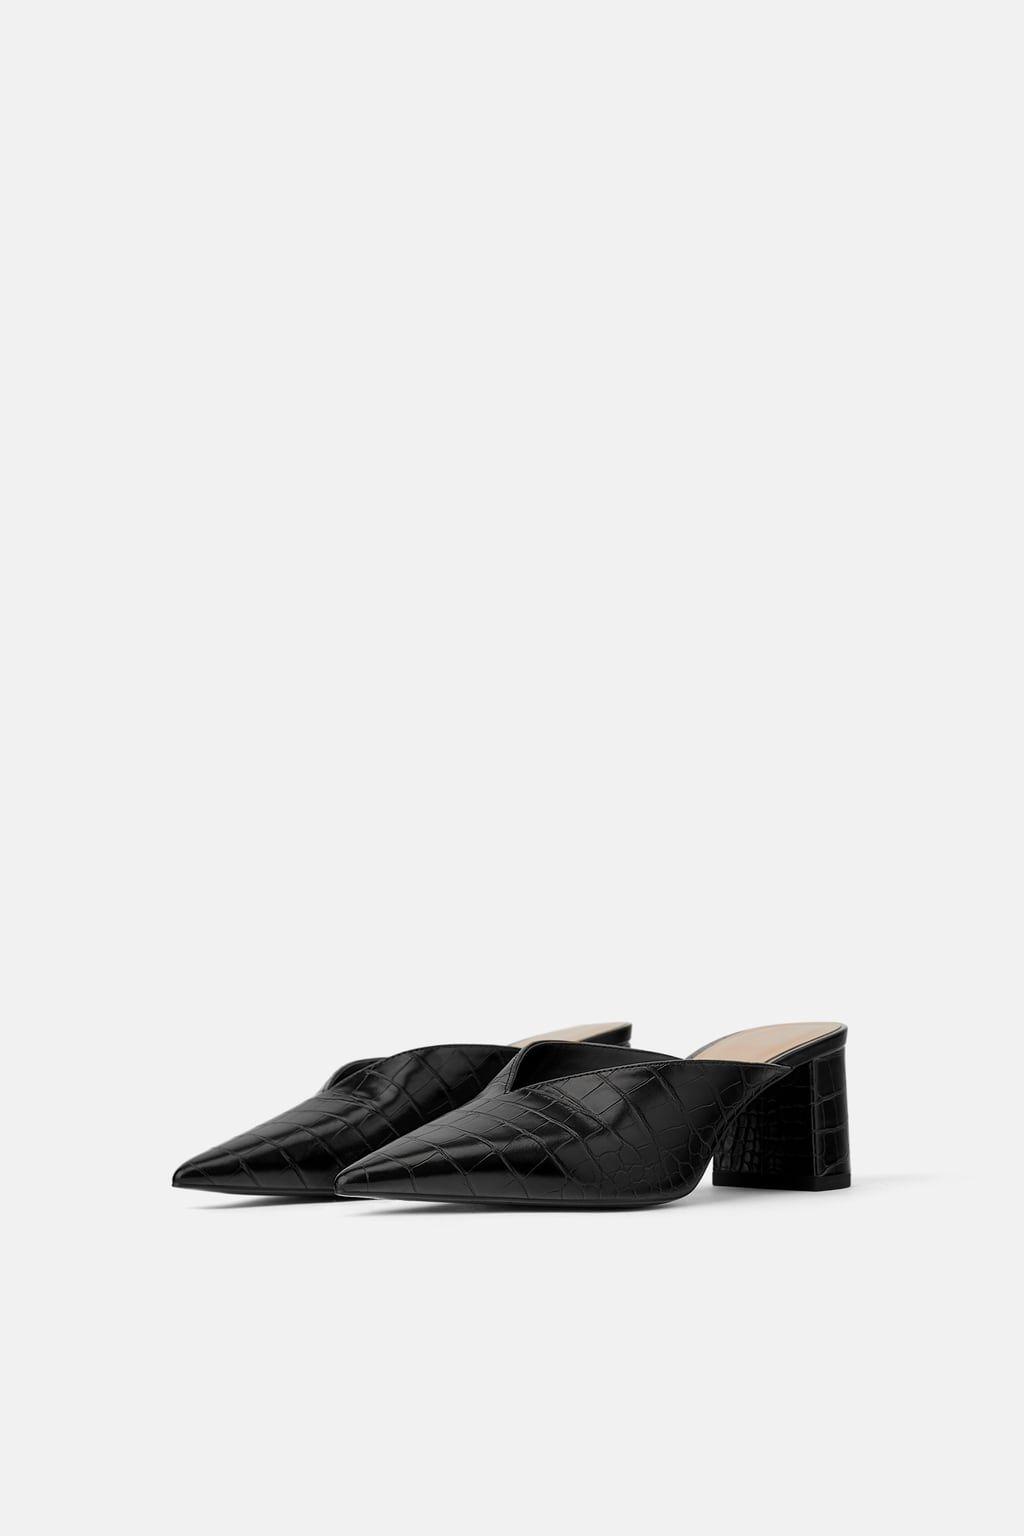 f6c49b0df78 Animal print v vamp high-heel mules in 2019 | Products I Love ...